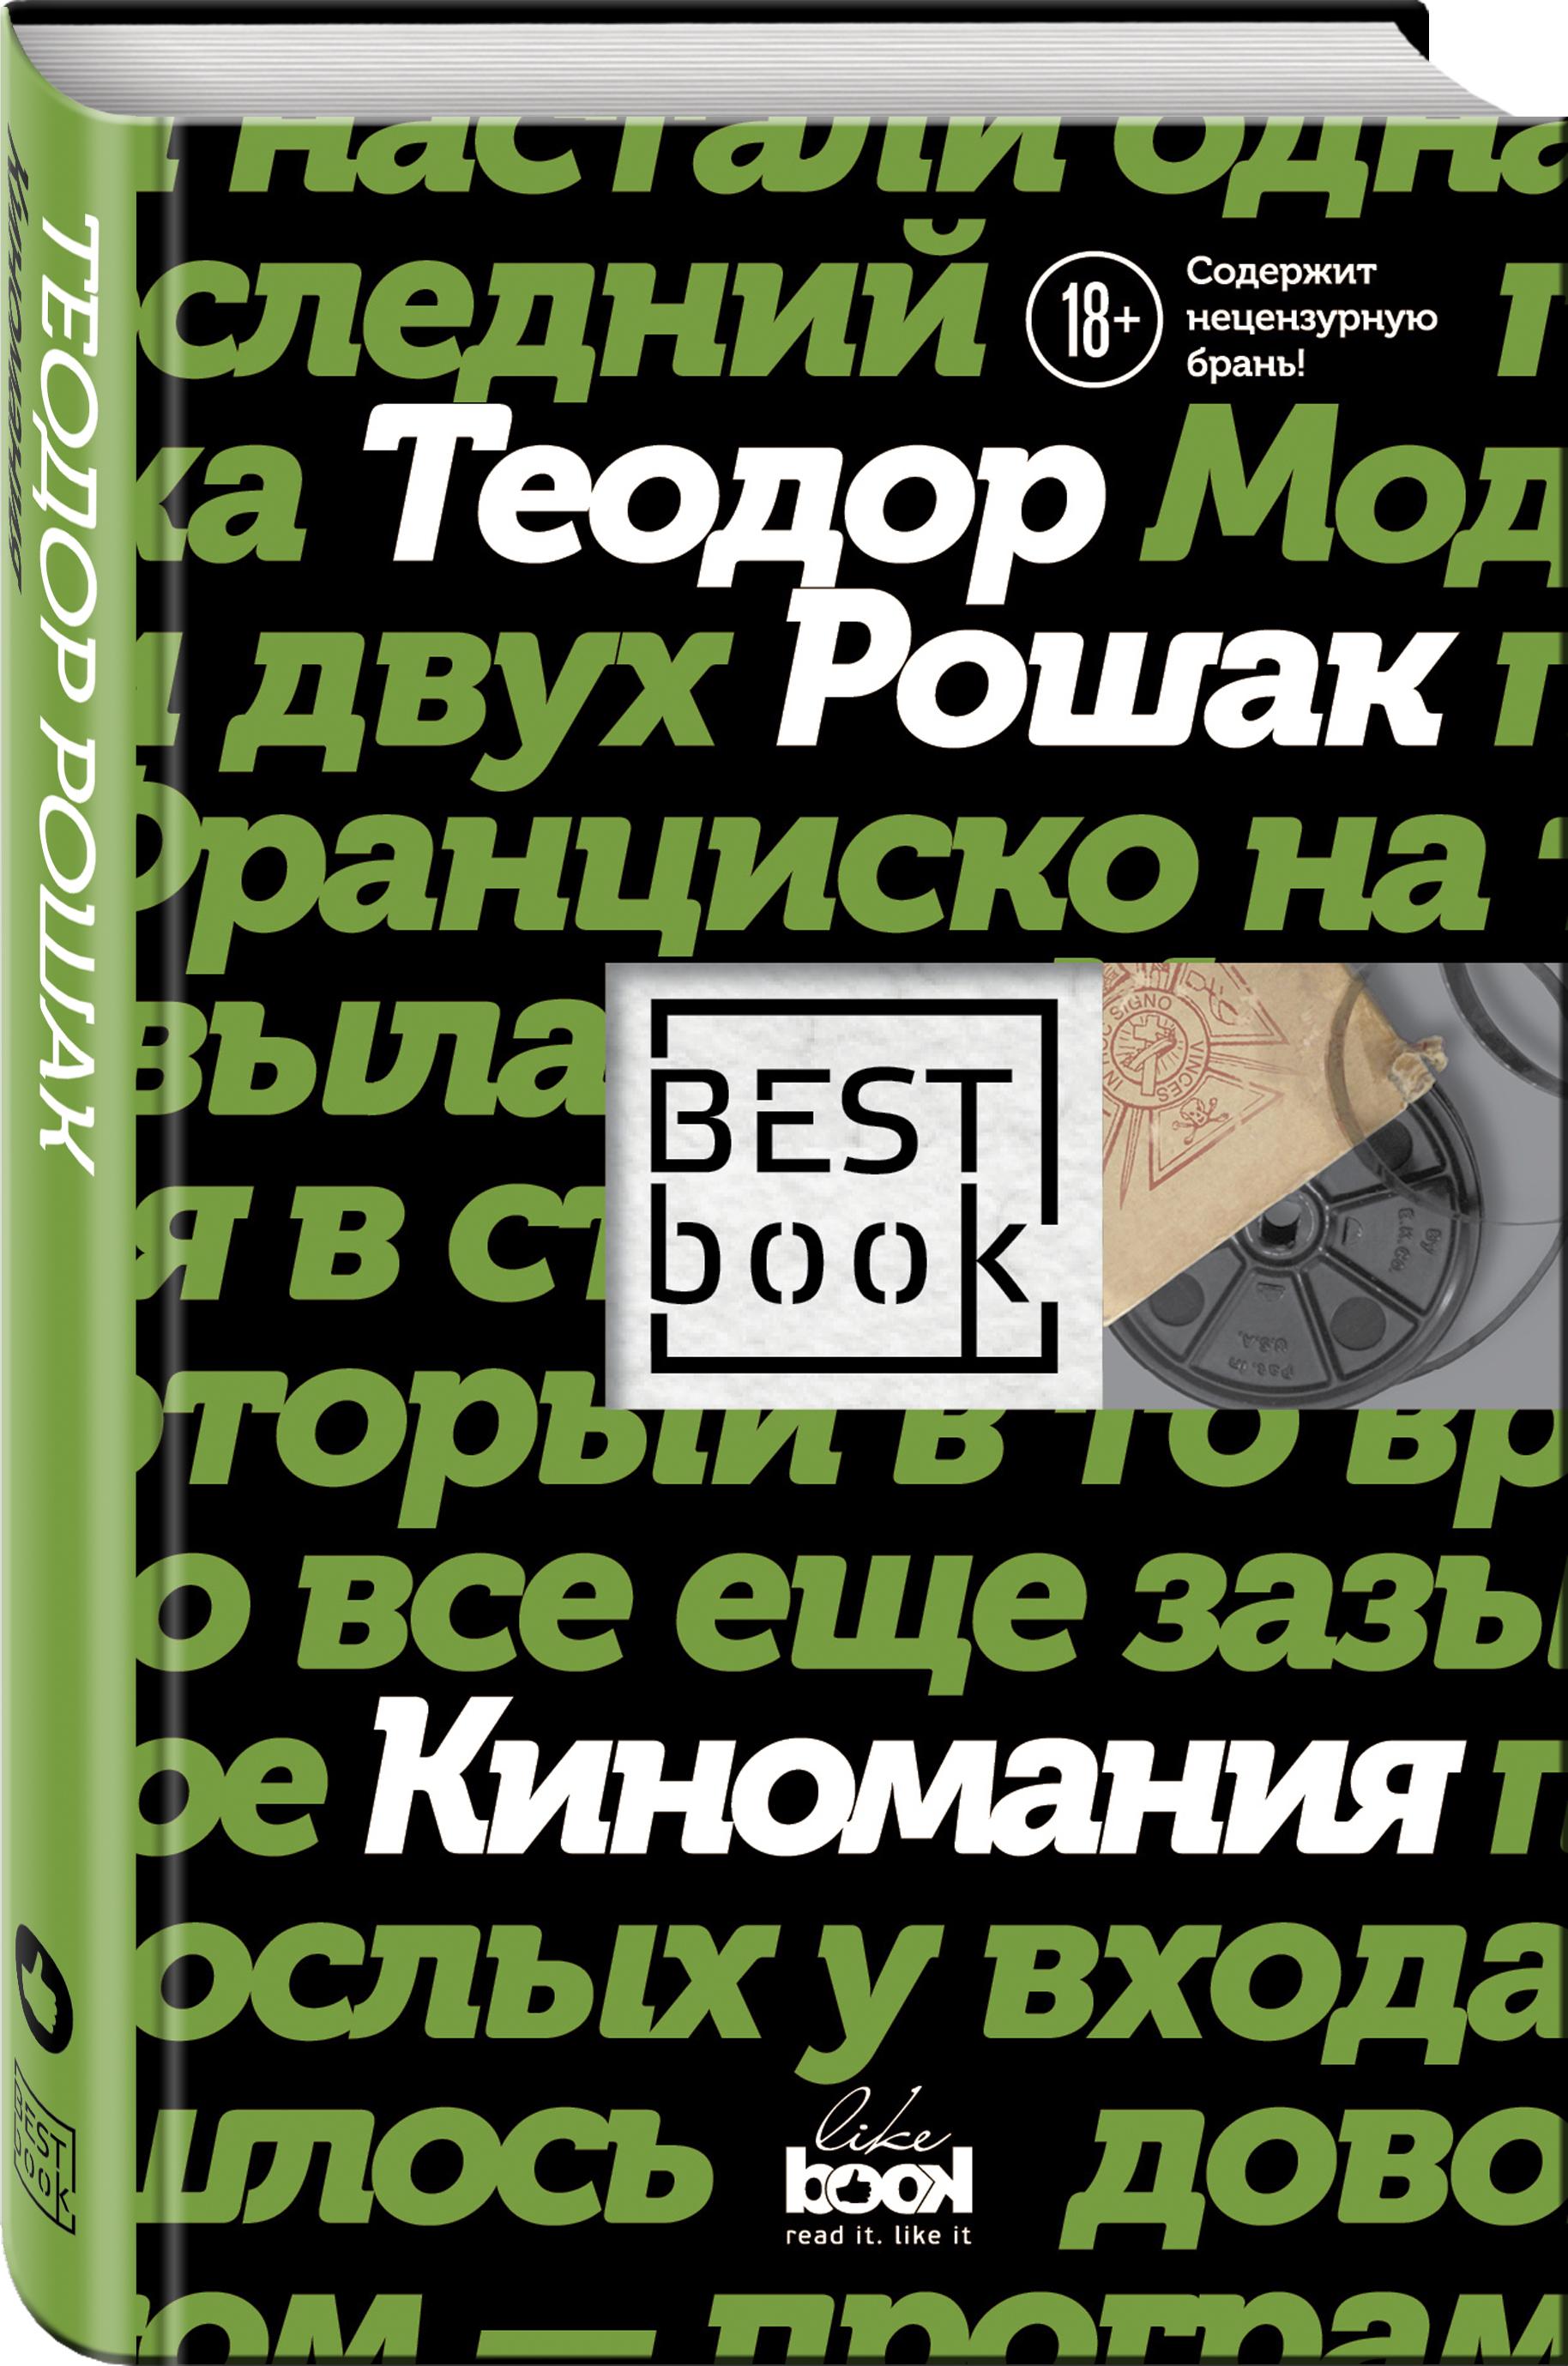 Теодор Рошак Киномания рошак теодор киномания